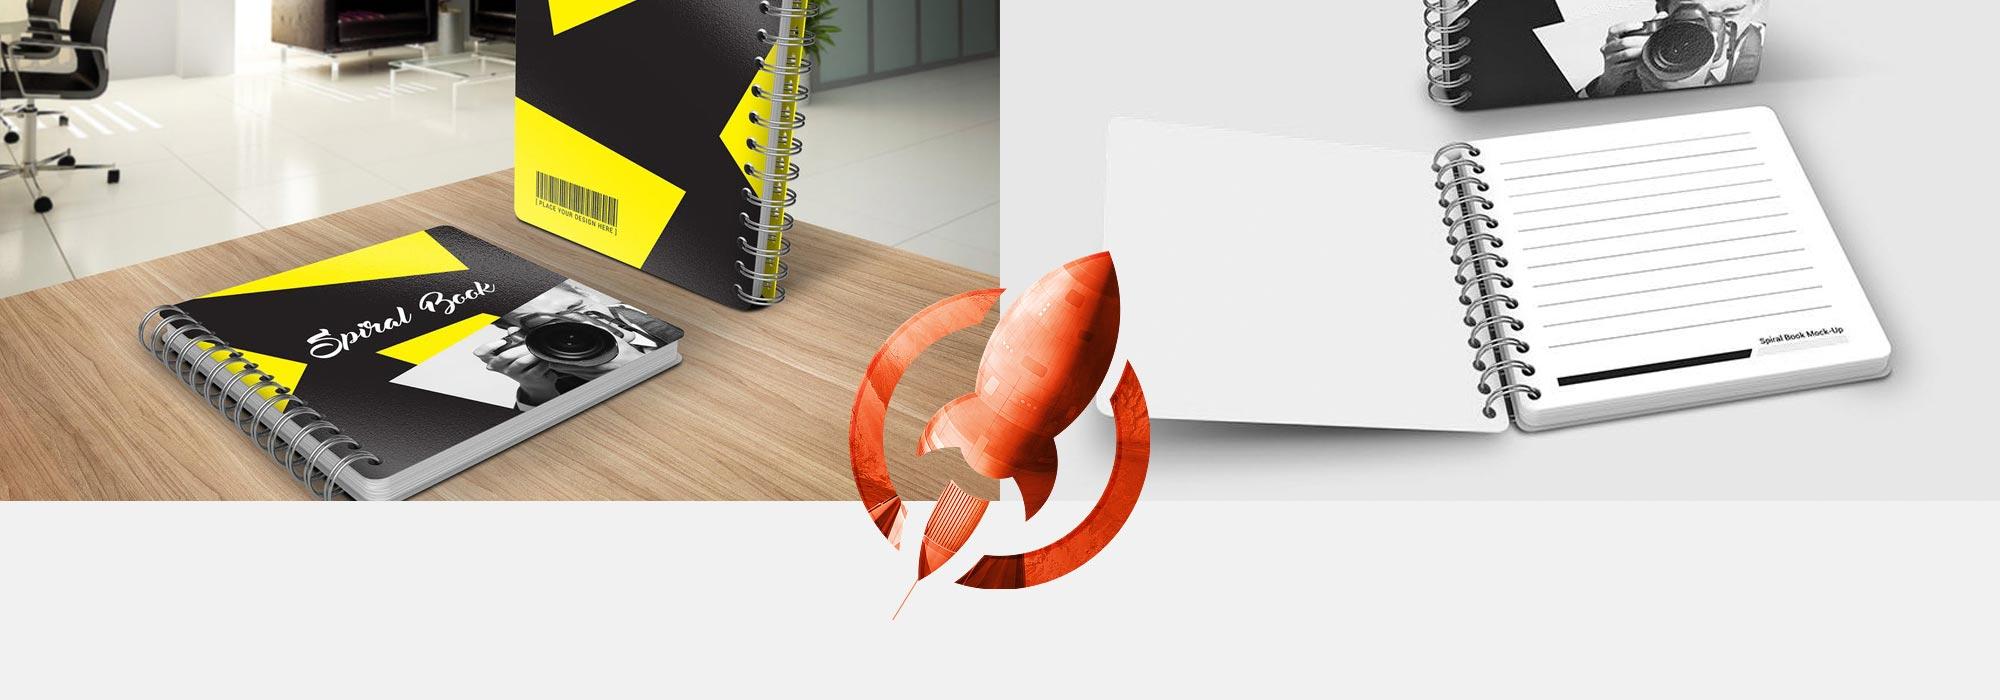 Custom Printed Notepads | Rush Flyer Printing | Same Day Printing